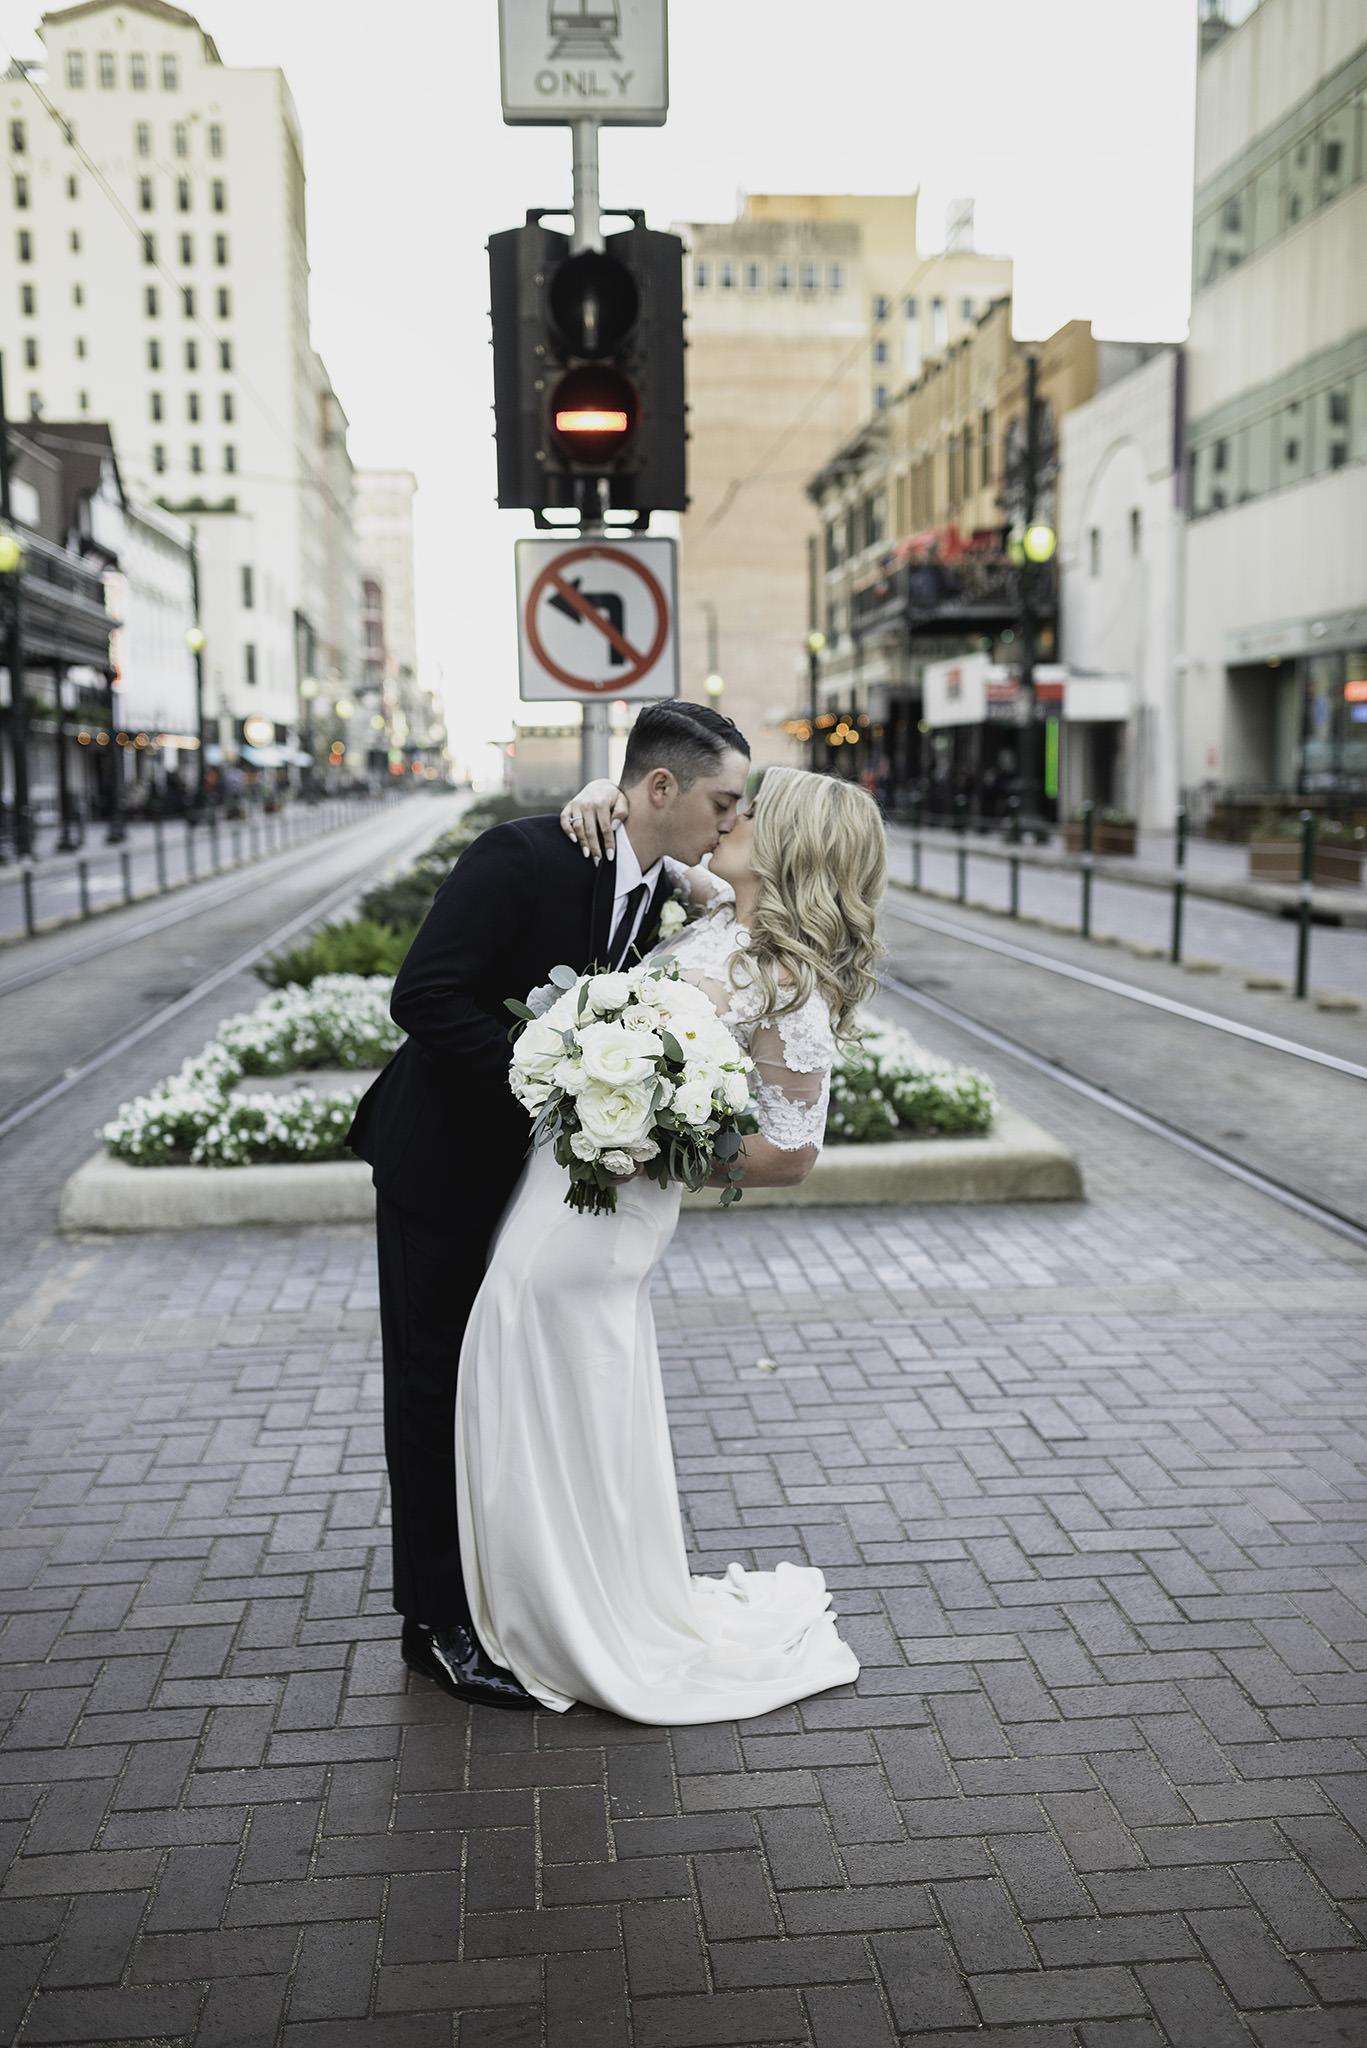 Claire-Travis-Classy-artistic-Downtown-Houston-Rice-ballroom-wedding-sm-011.jpg